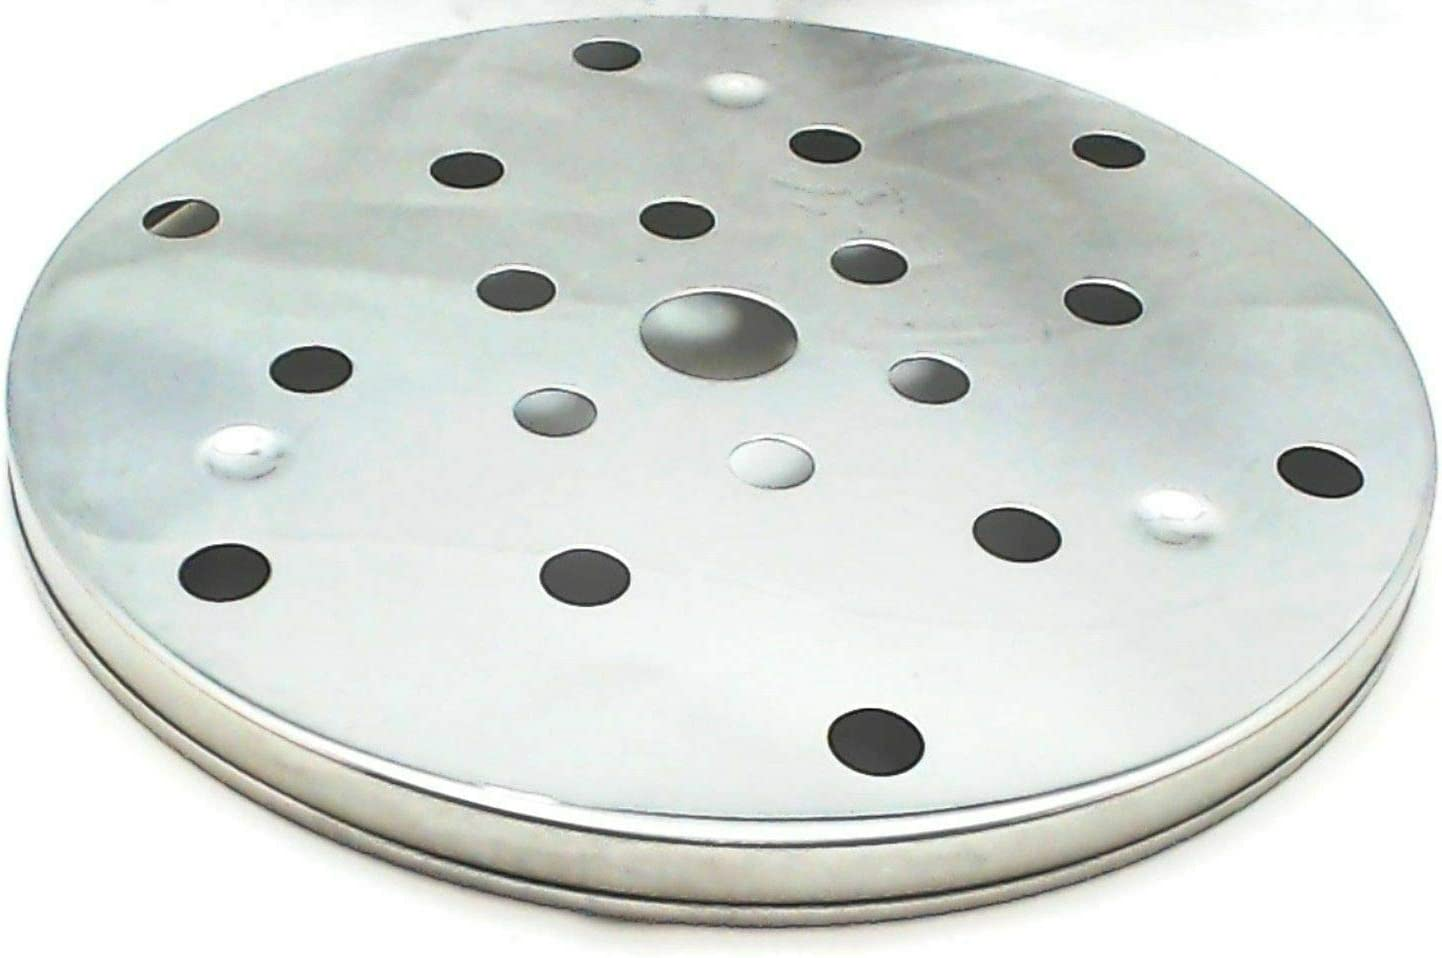 Presto Pressure Cooker Stainless Steel Rack Gifts 44276 Cooking 8588 Japan Maker New